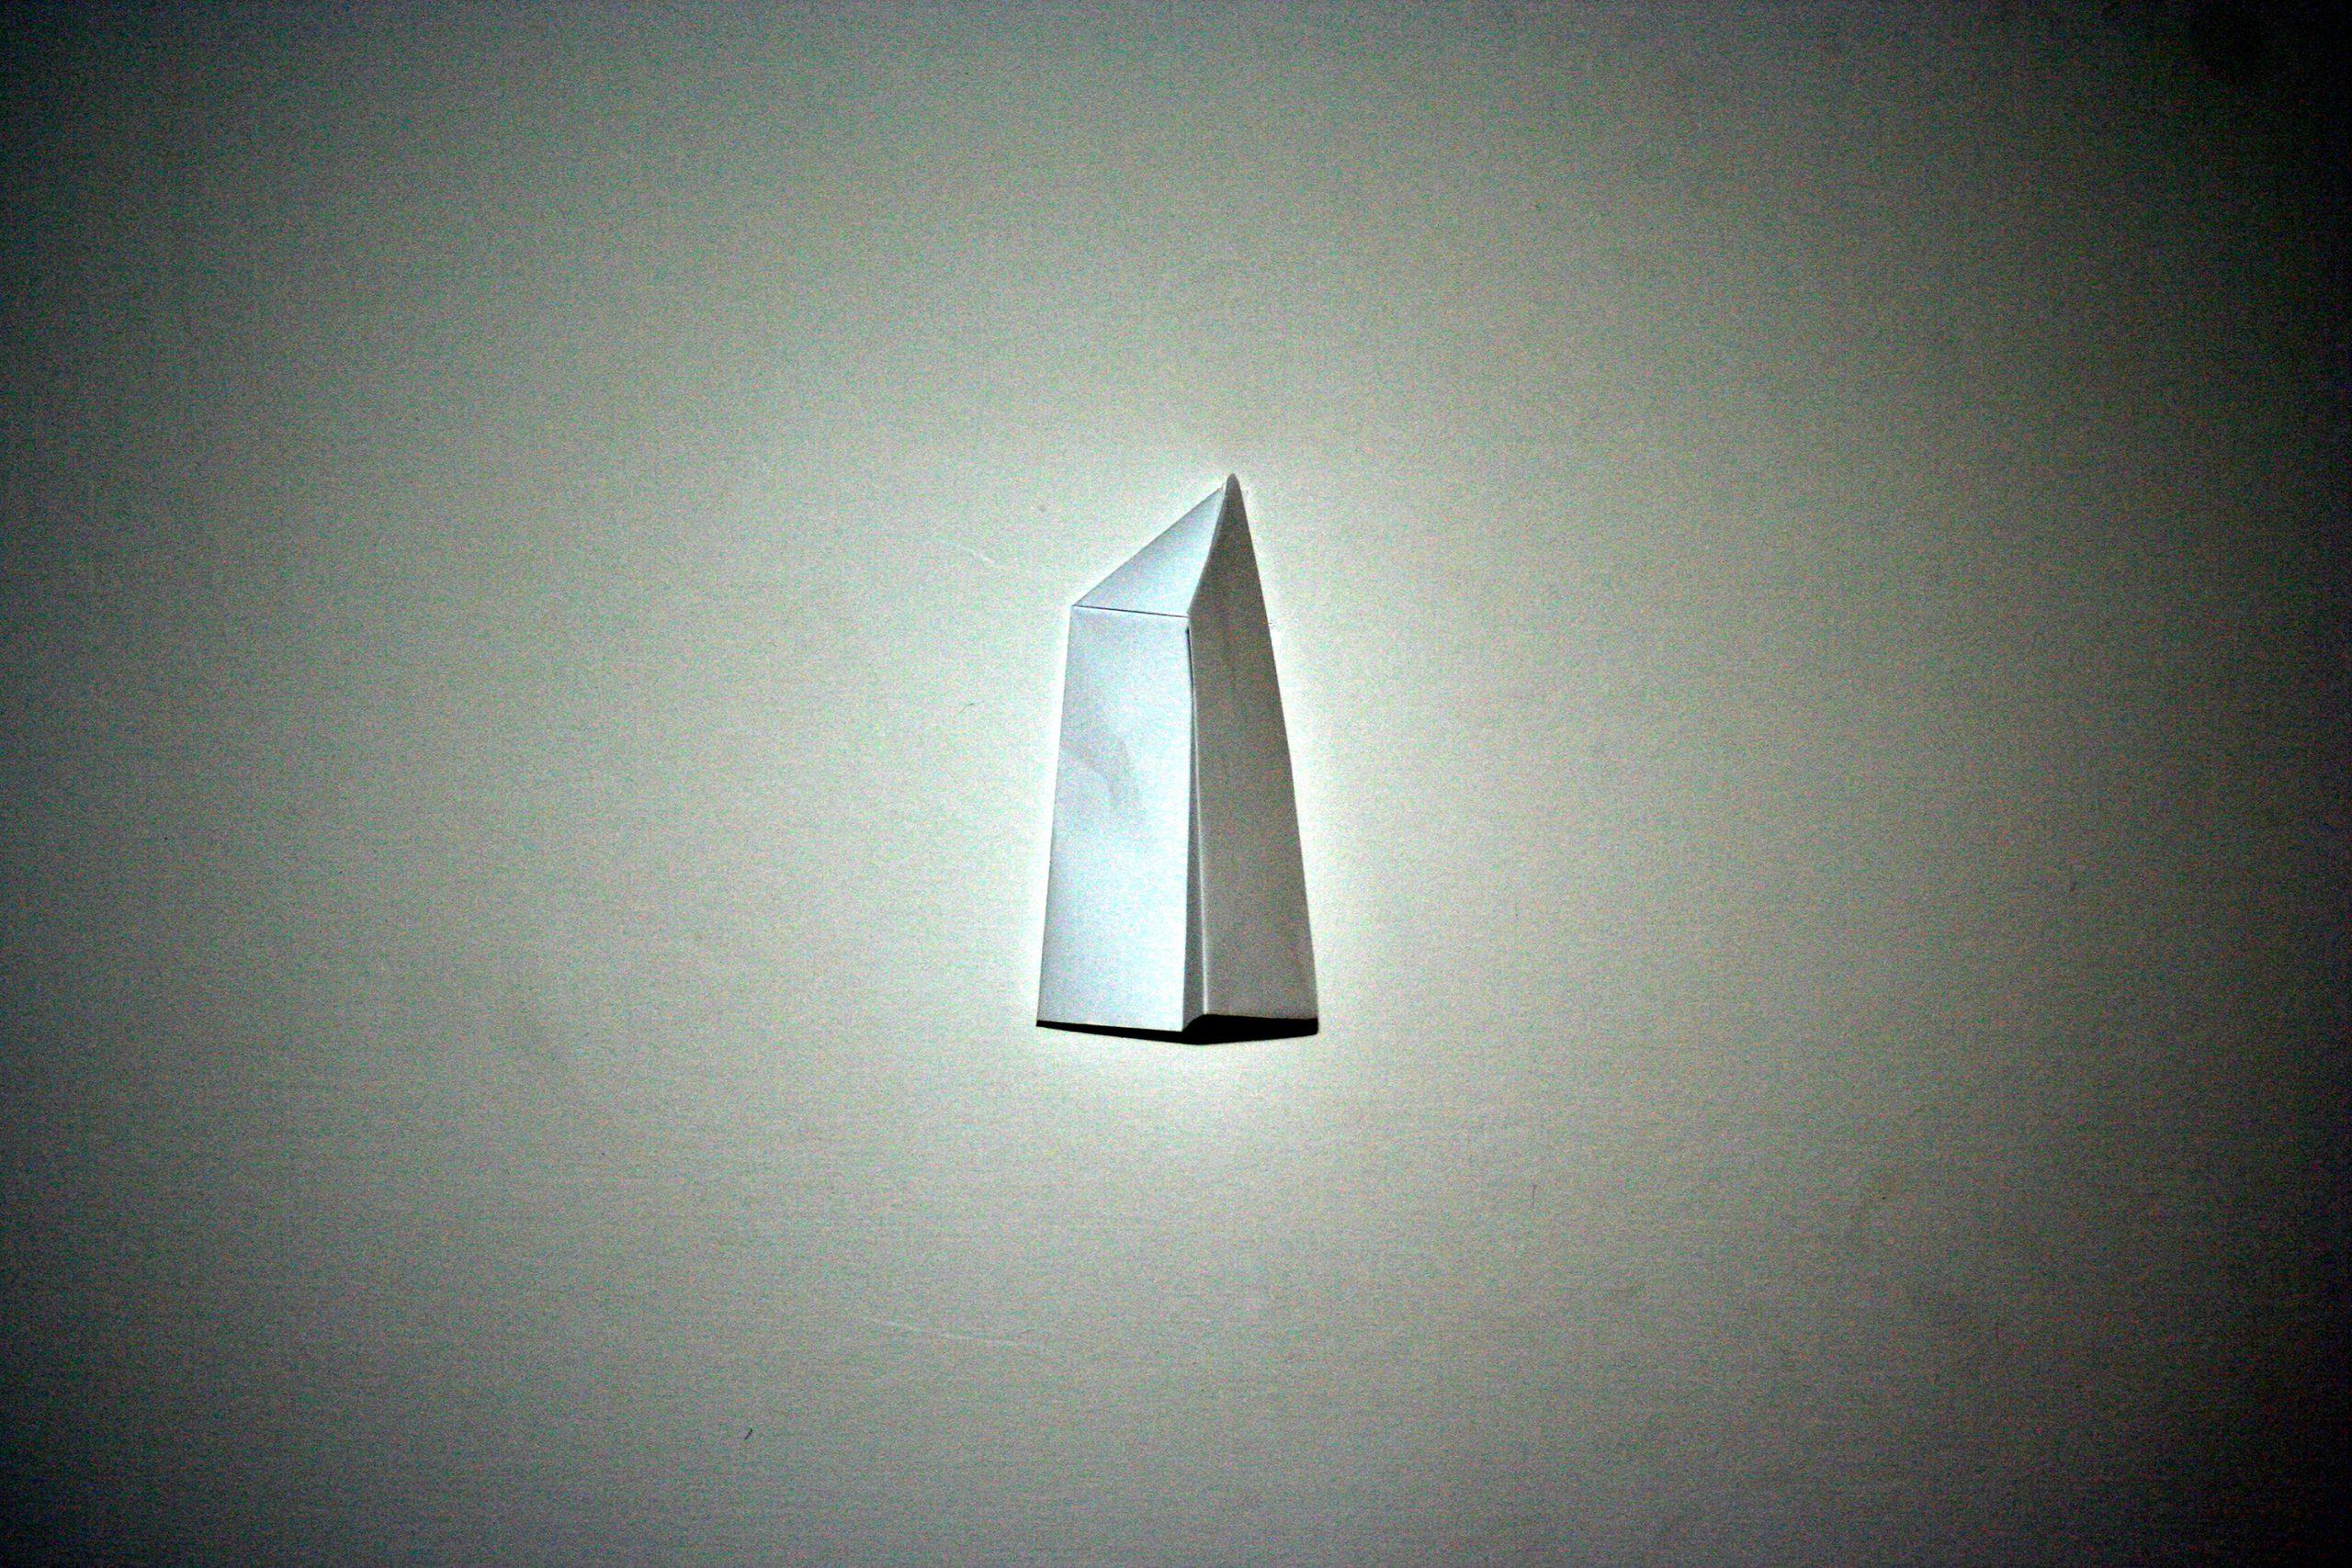 Anna Yam, Untitled. Edition 1 of 5 + 2 AP. $4,000